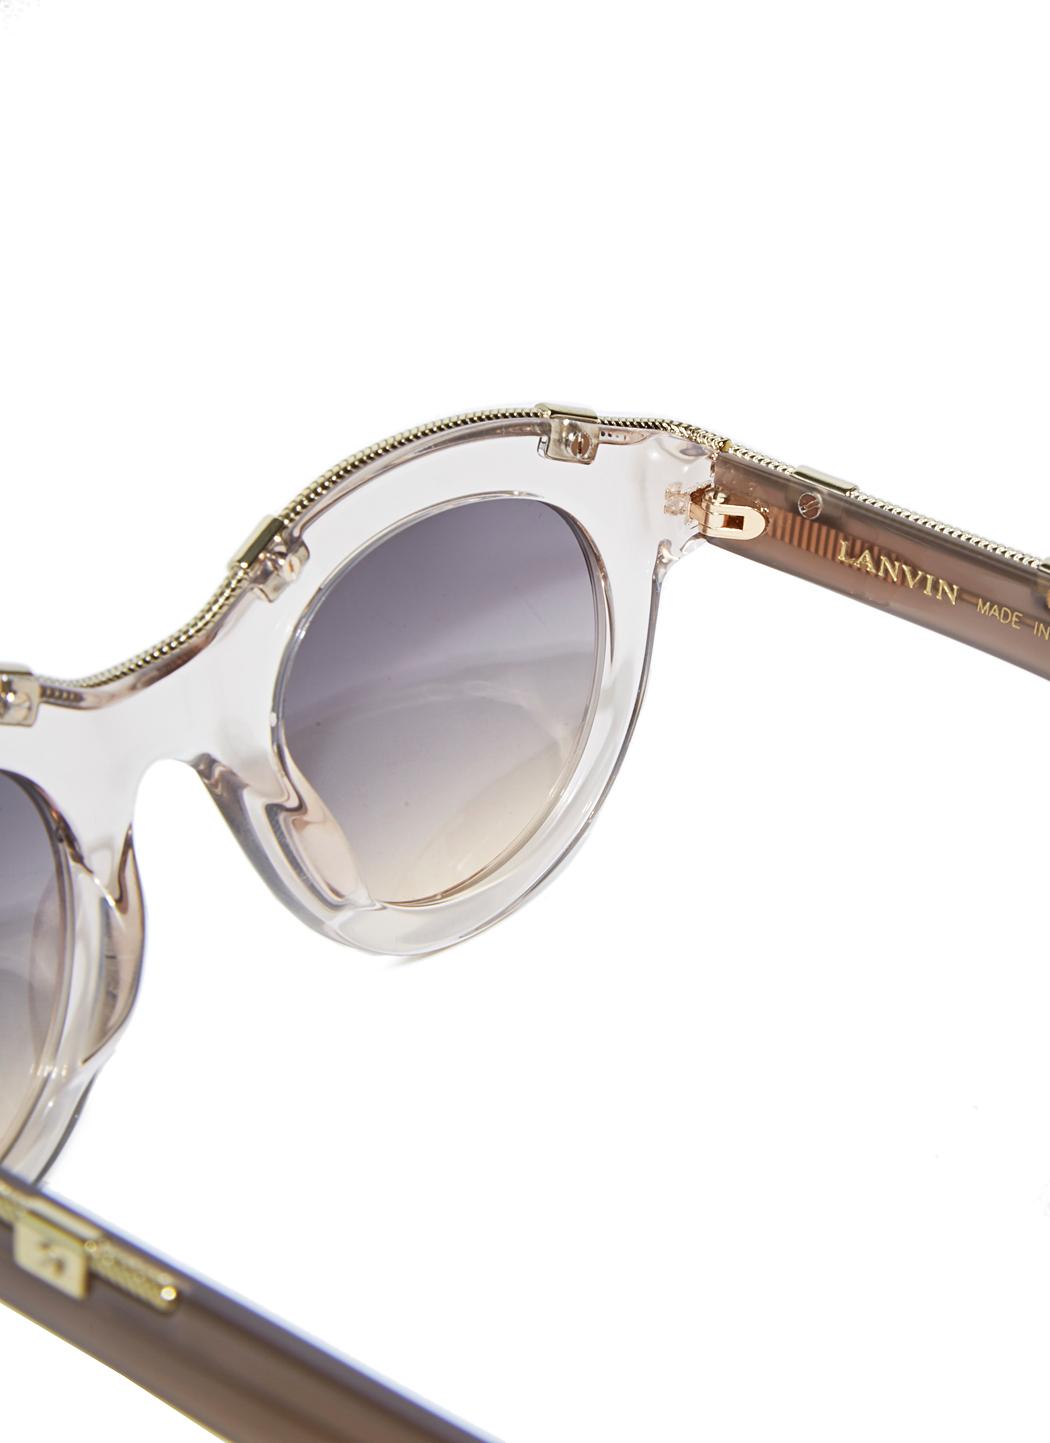 8ff25d3fd3 Lanvin Glasses Frames - Best Glasses Cnapracticetesting.Com 2018